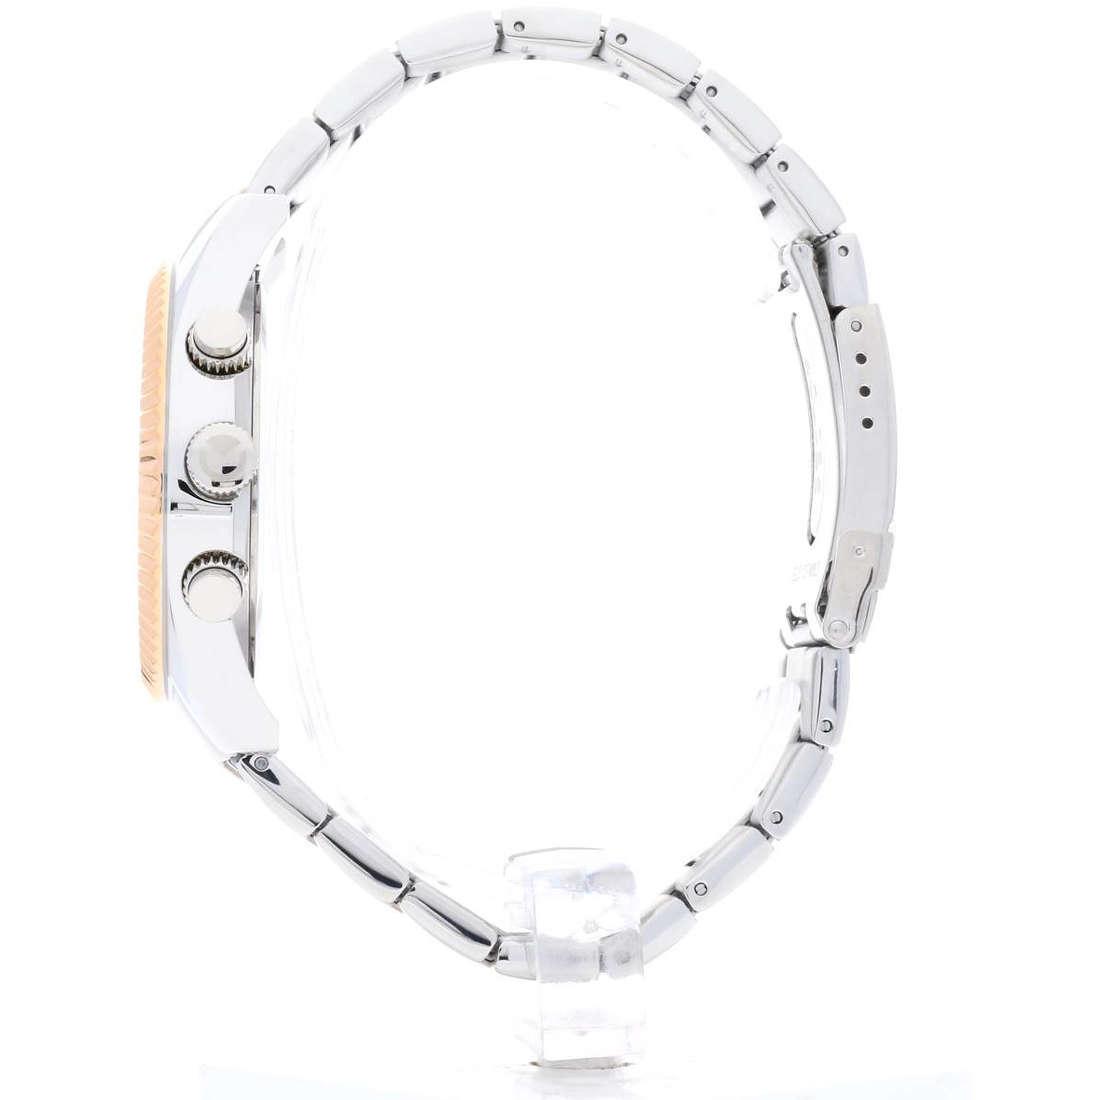 prix montres homme Sector R3273676001